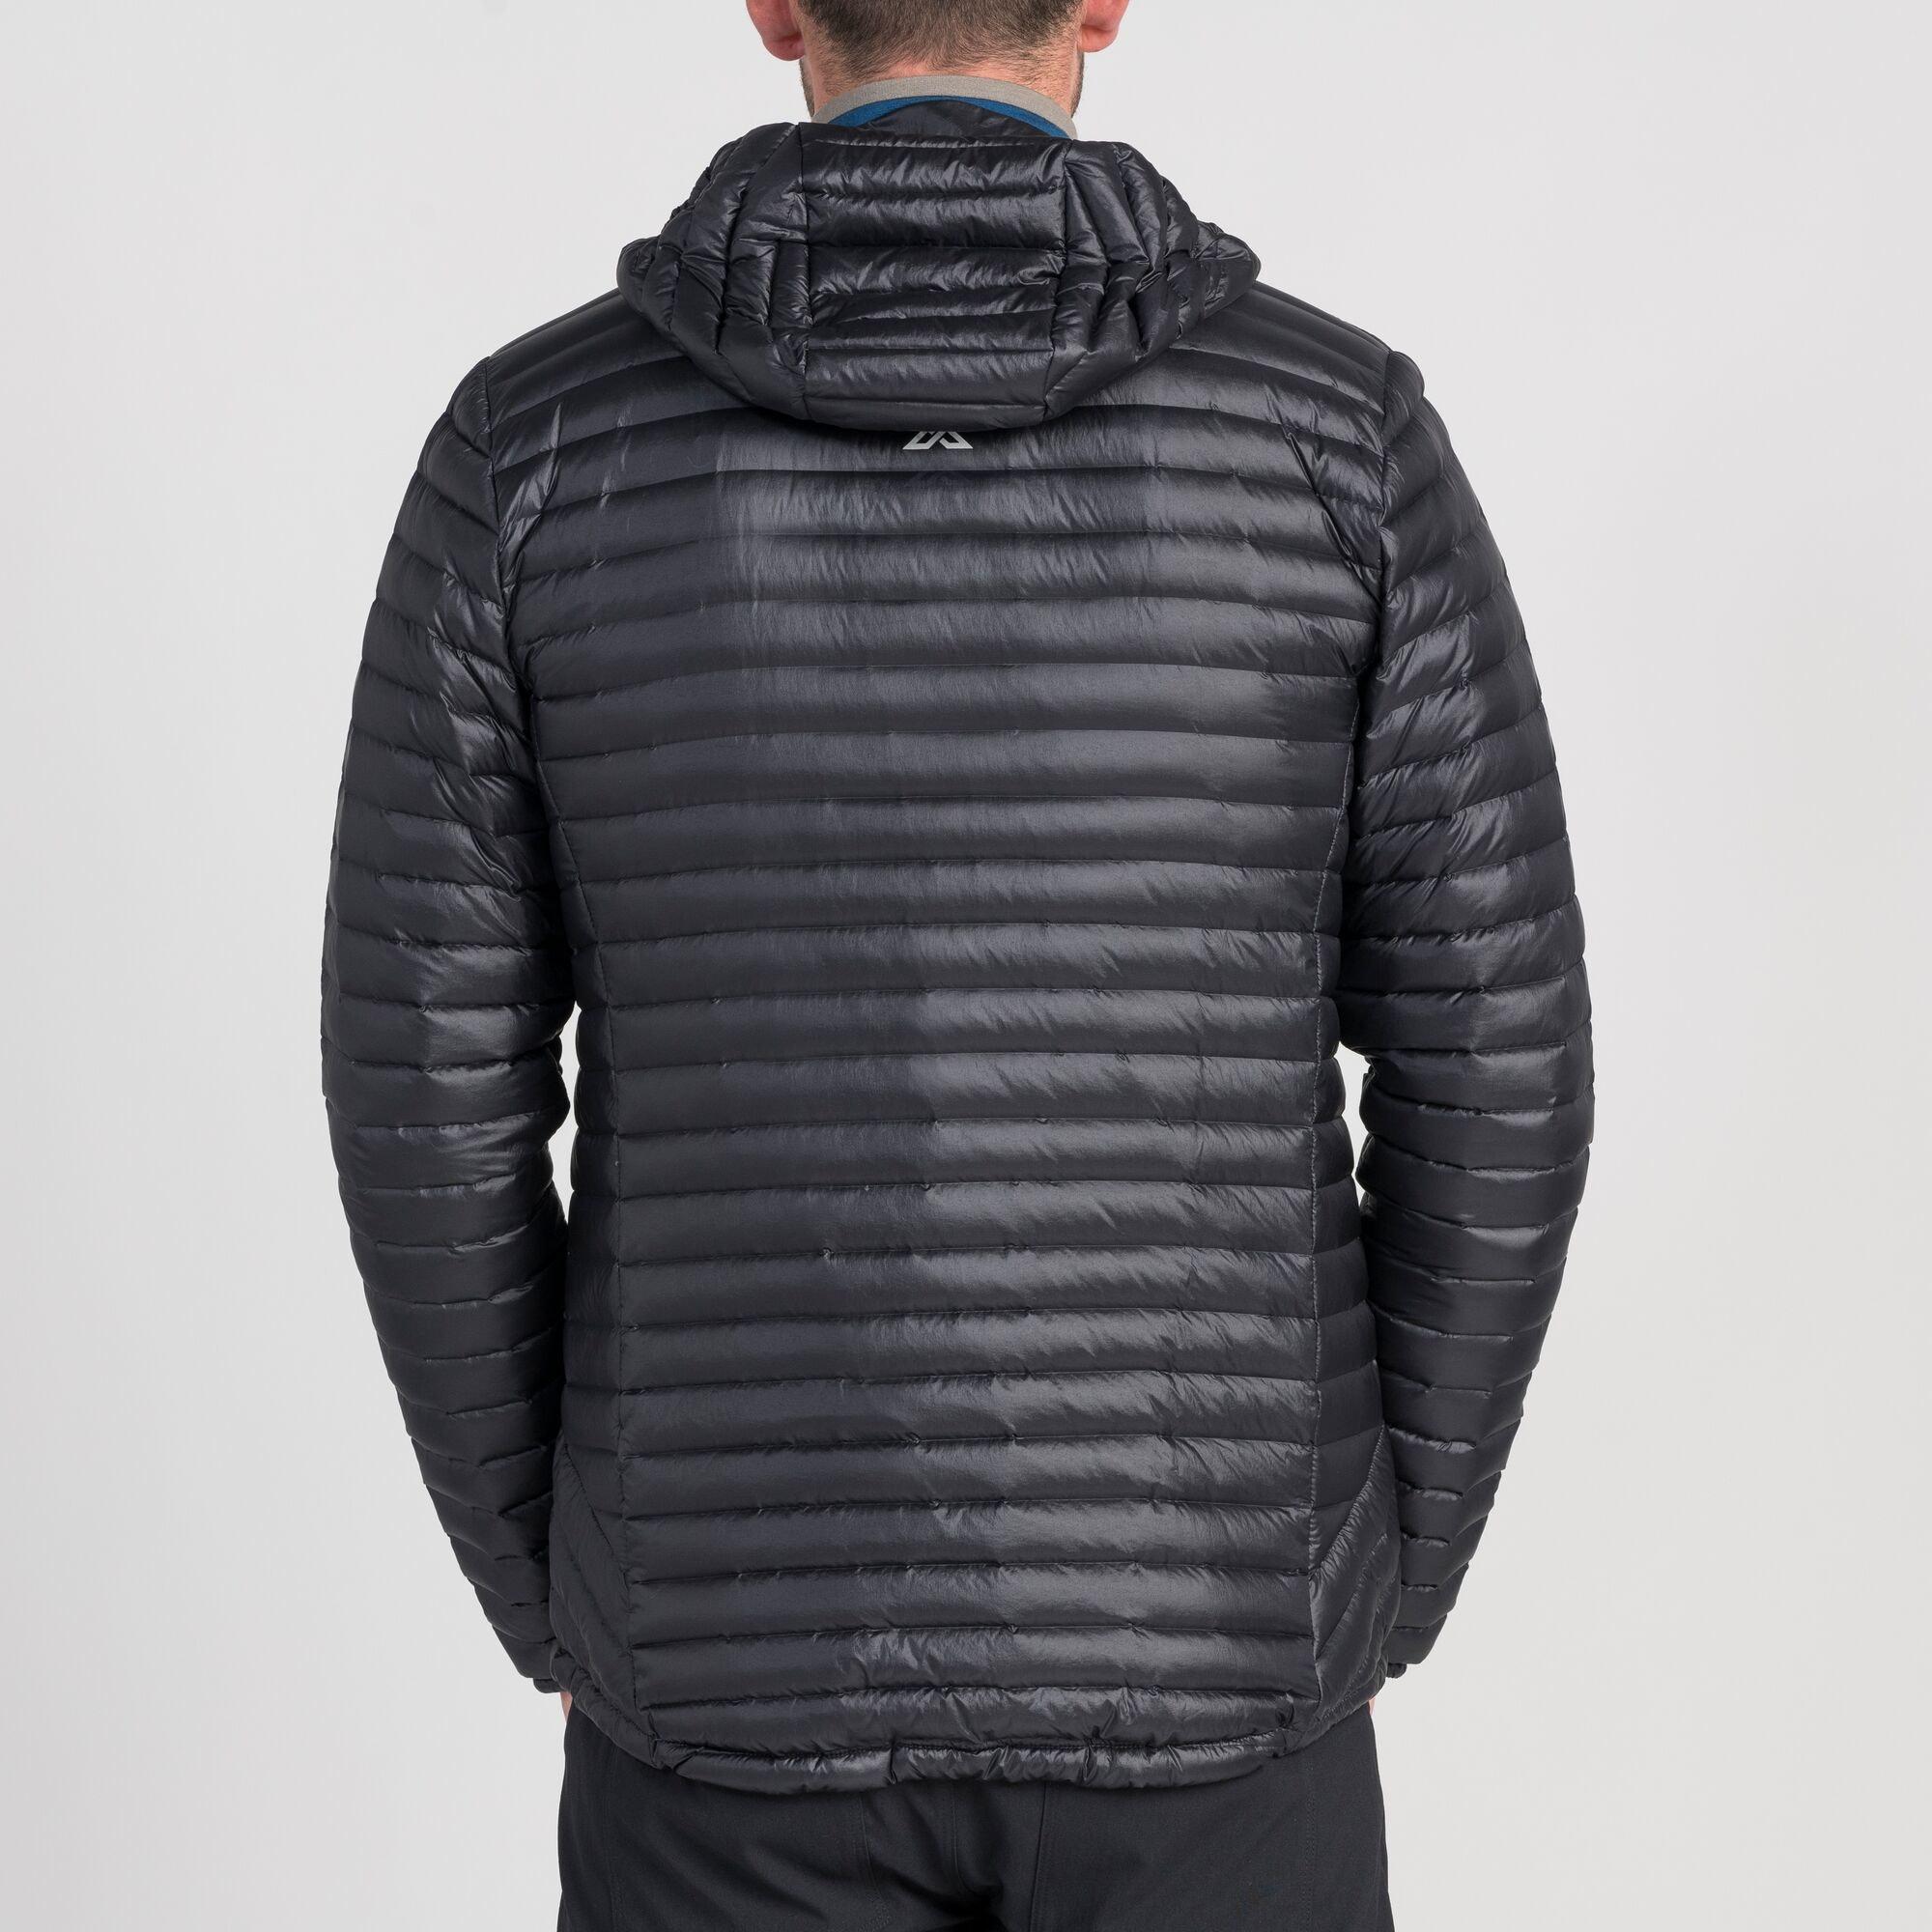 thumbnail 12 - NEW Kathmandu Flinders Lightweight Water-Repellent Warm Men's Down Puffer Jacket